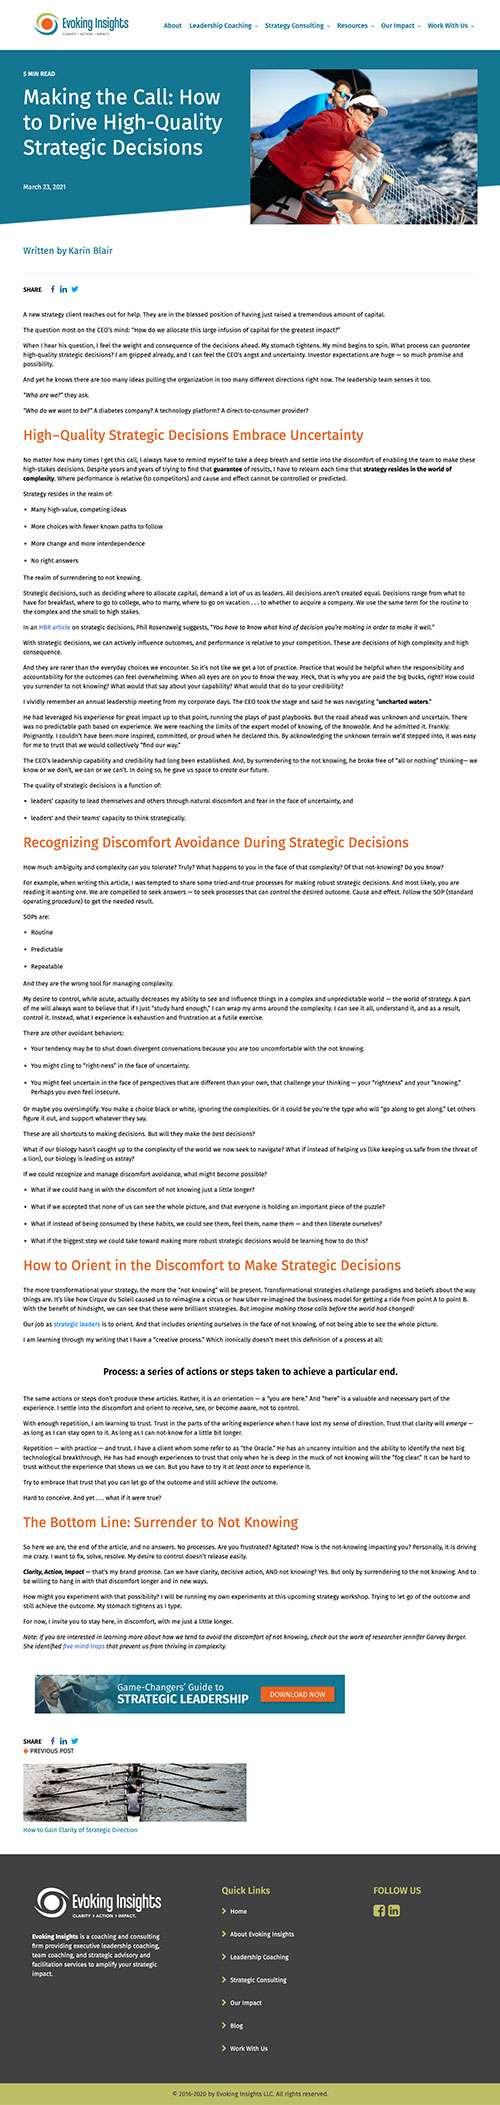 Evoking-Insights-Blog